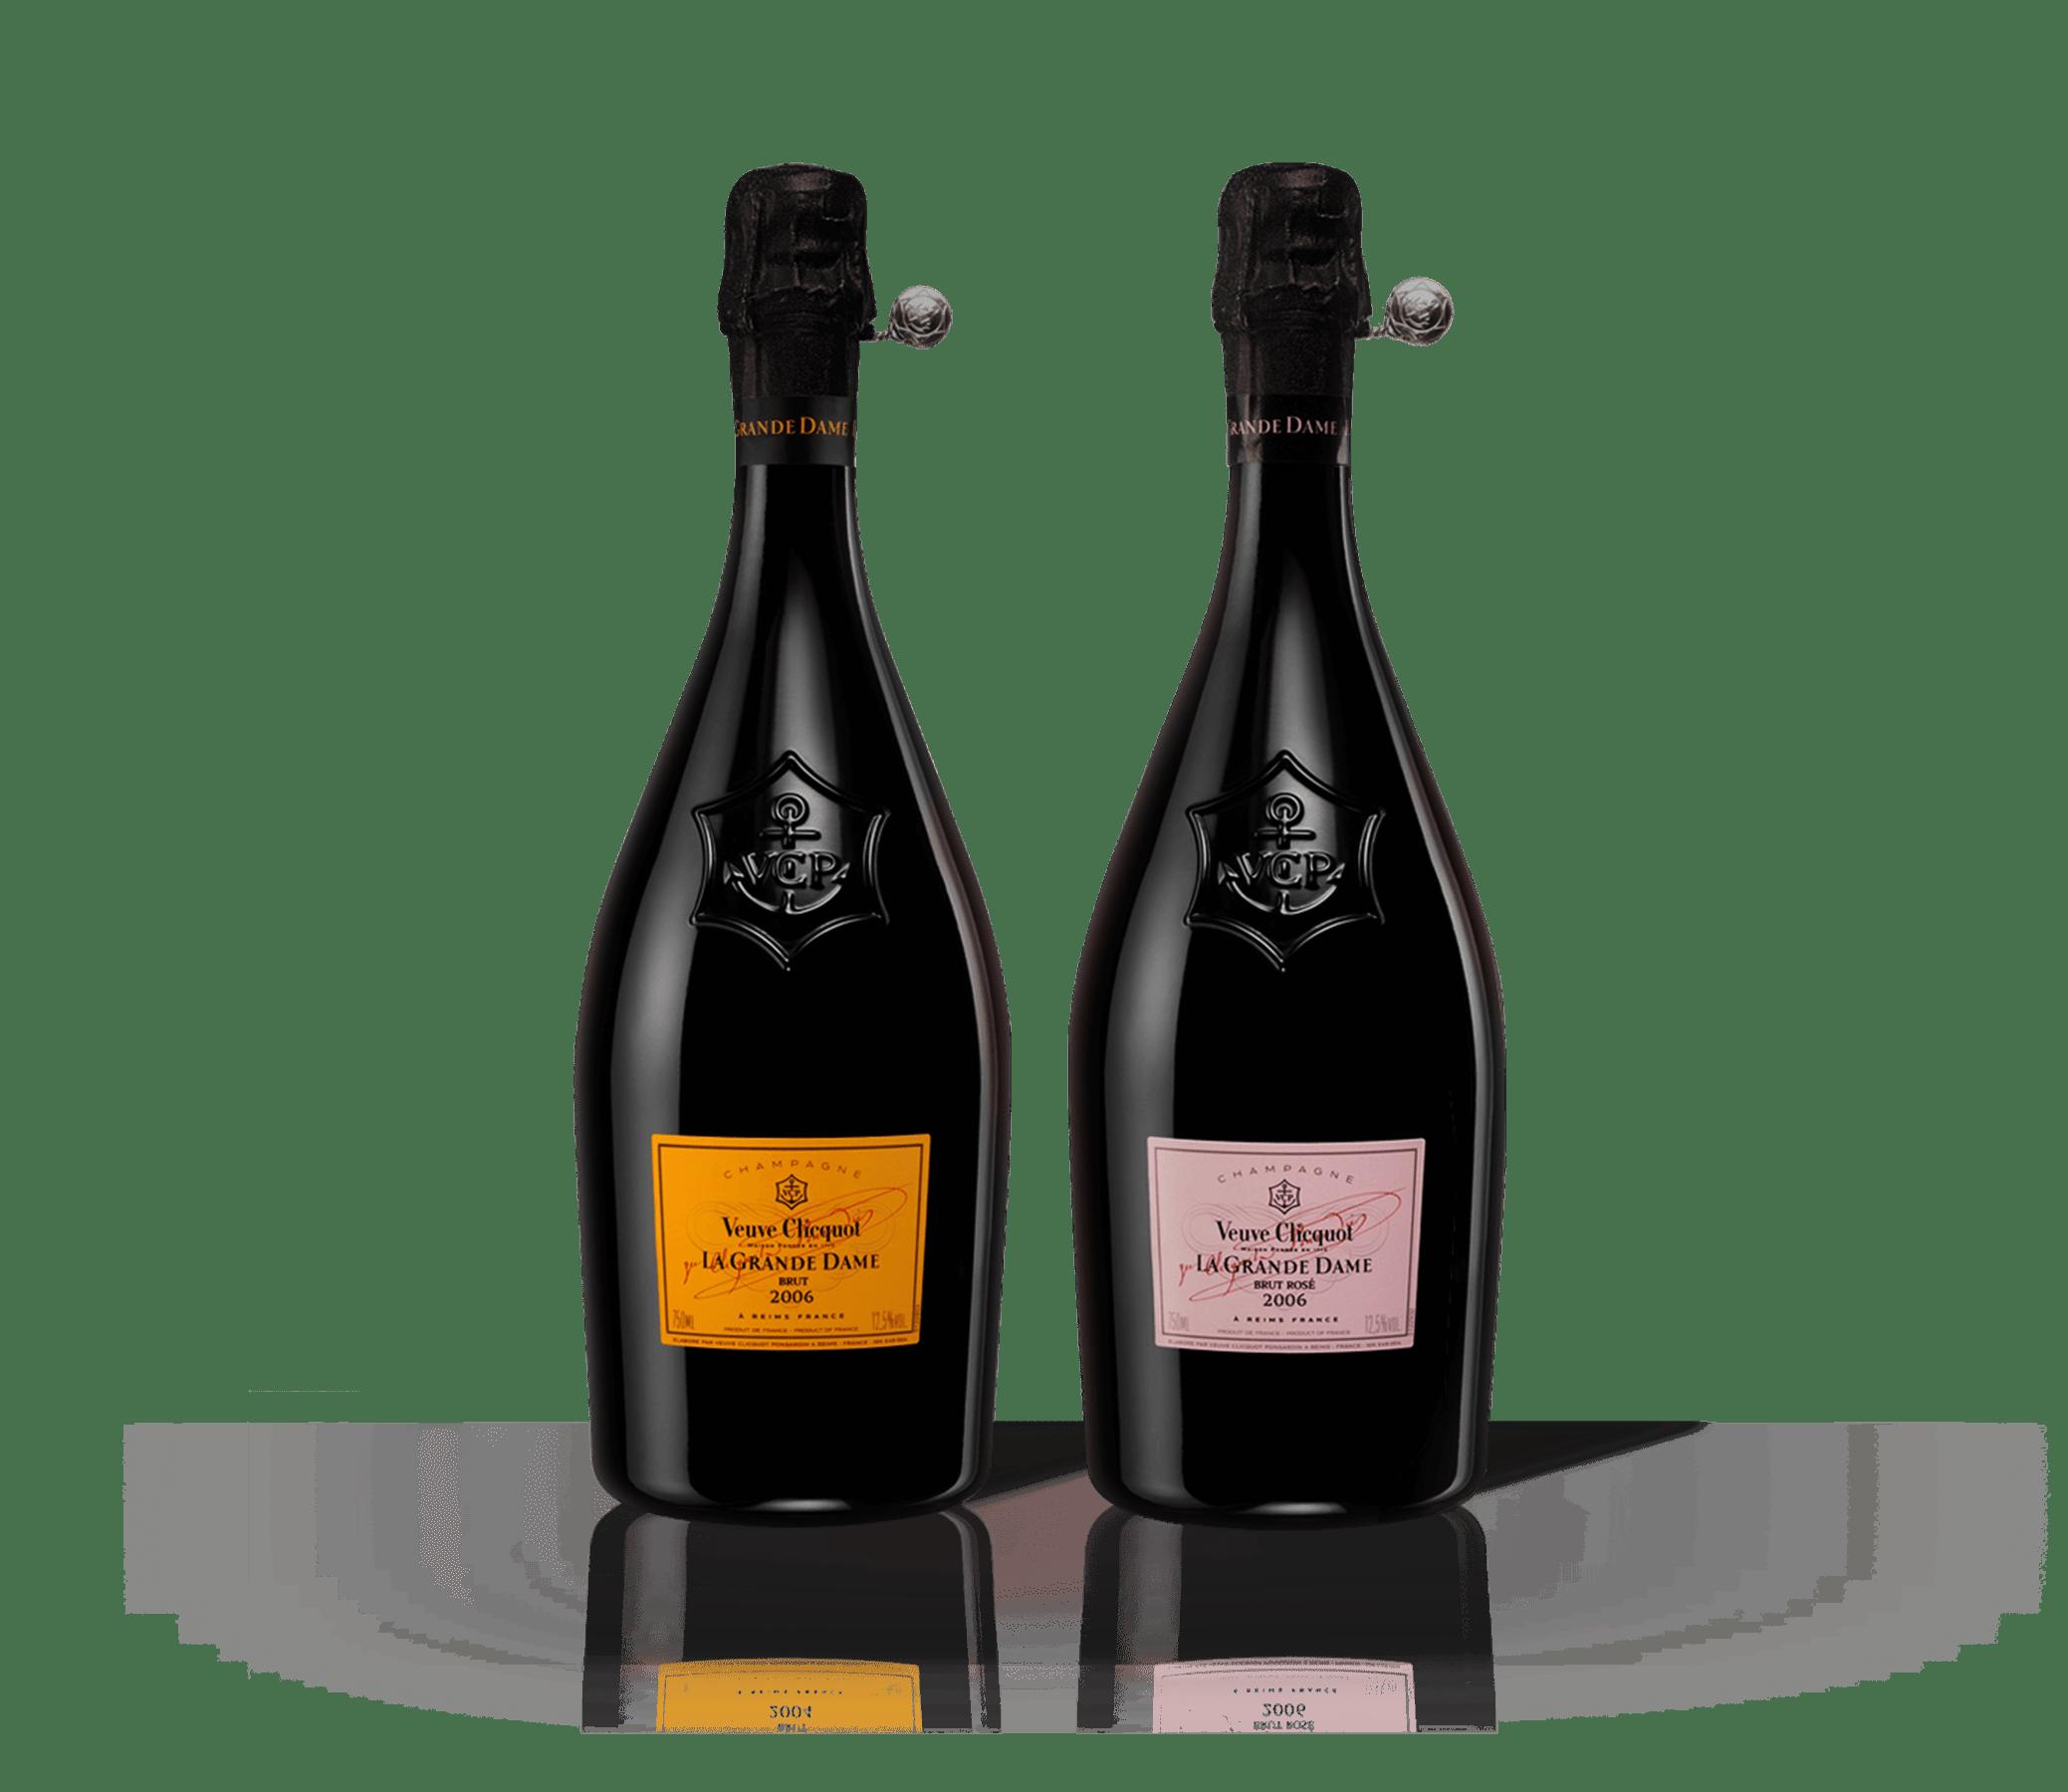 Bottles Veuve Clicquot Champagne La Grande Dame 2008